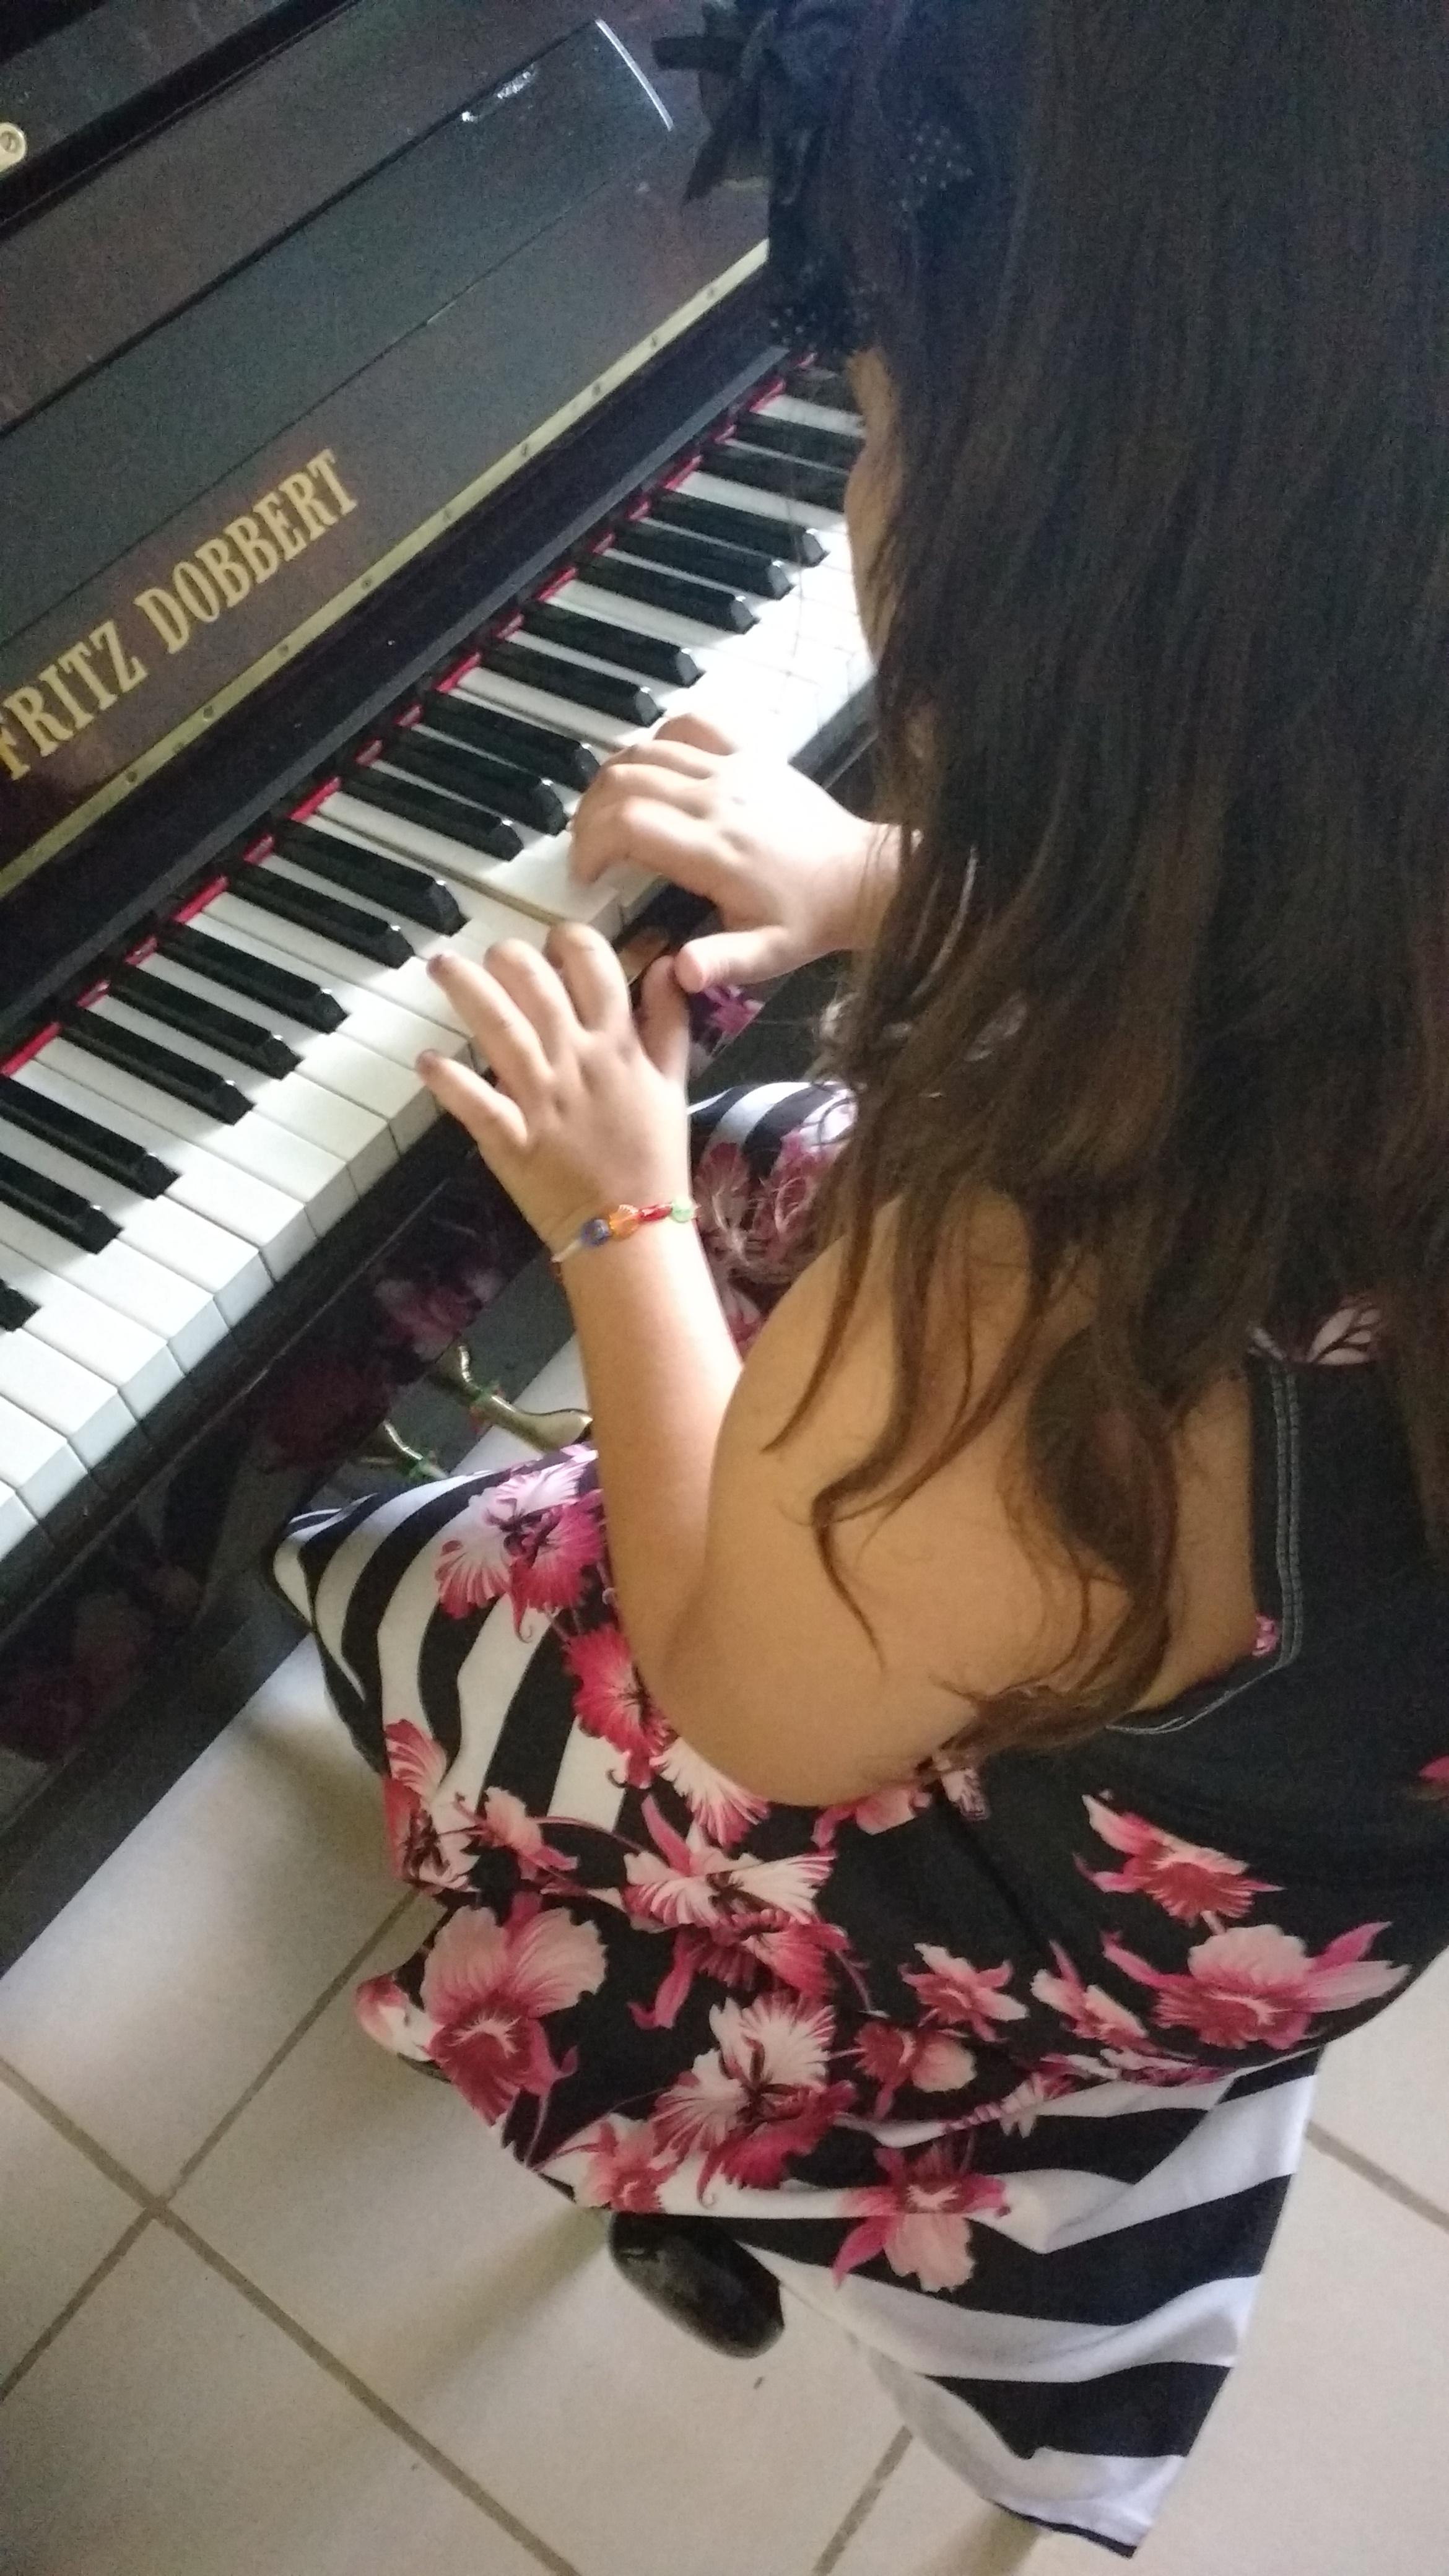 aula de teclado para iniciantes jf luciane borges